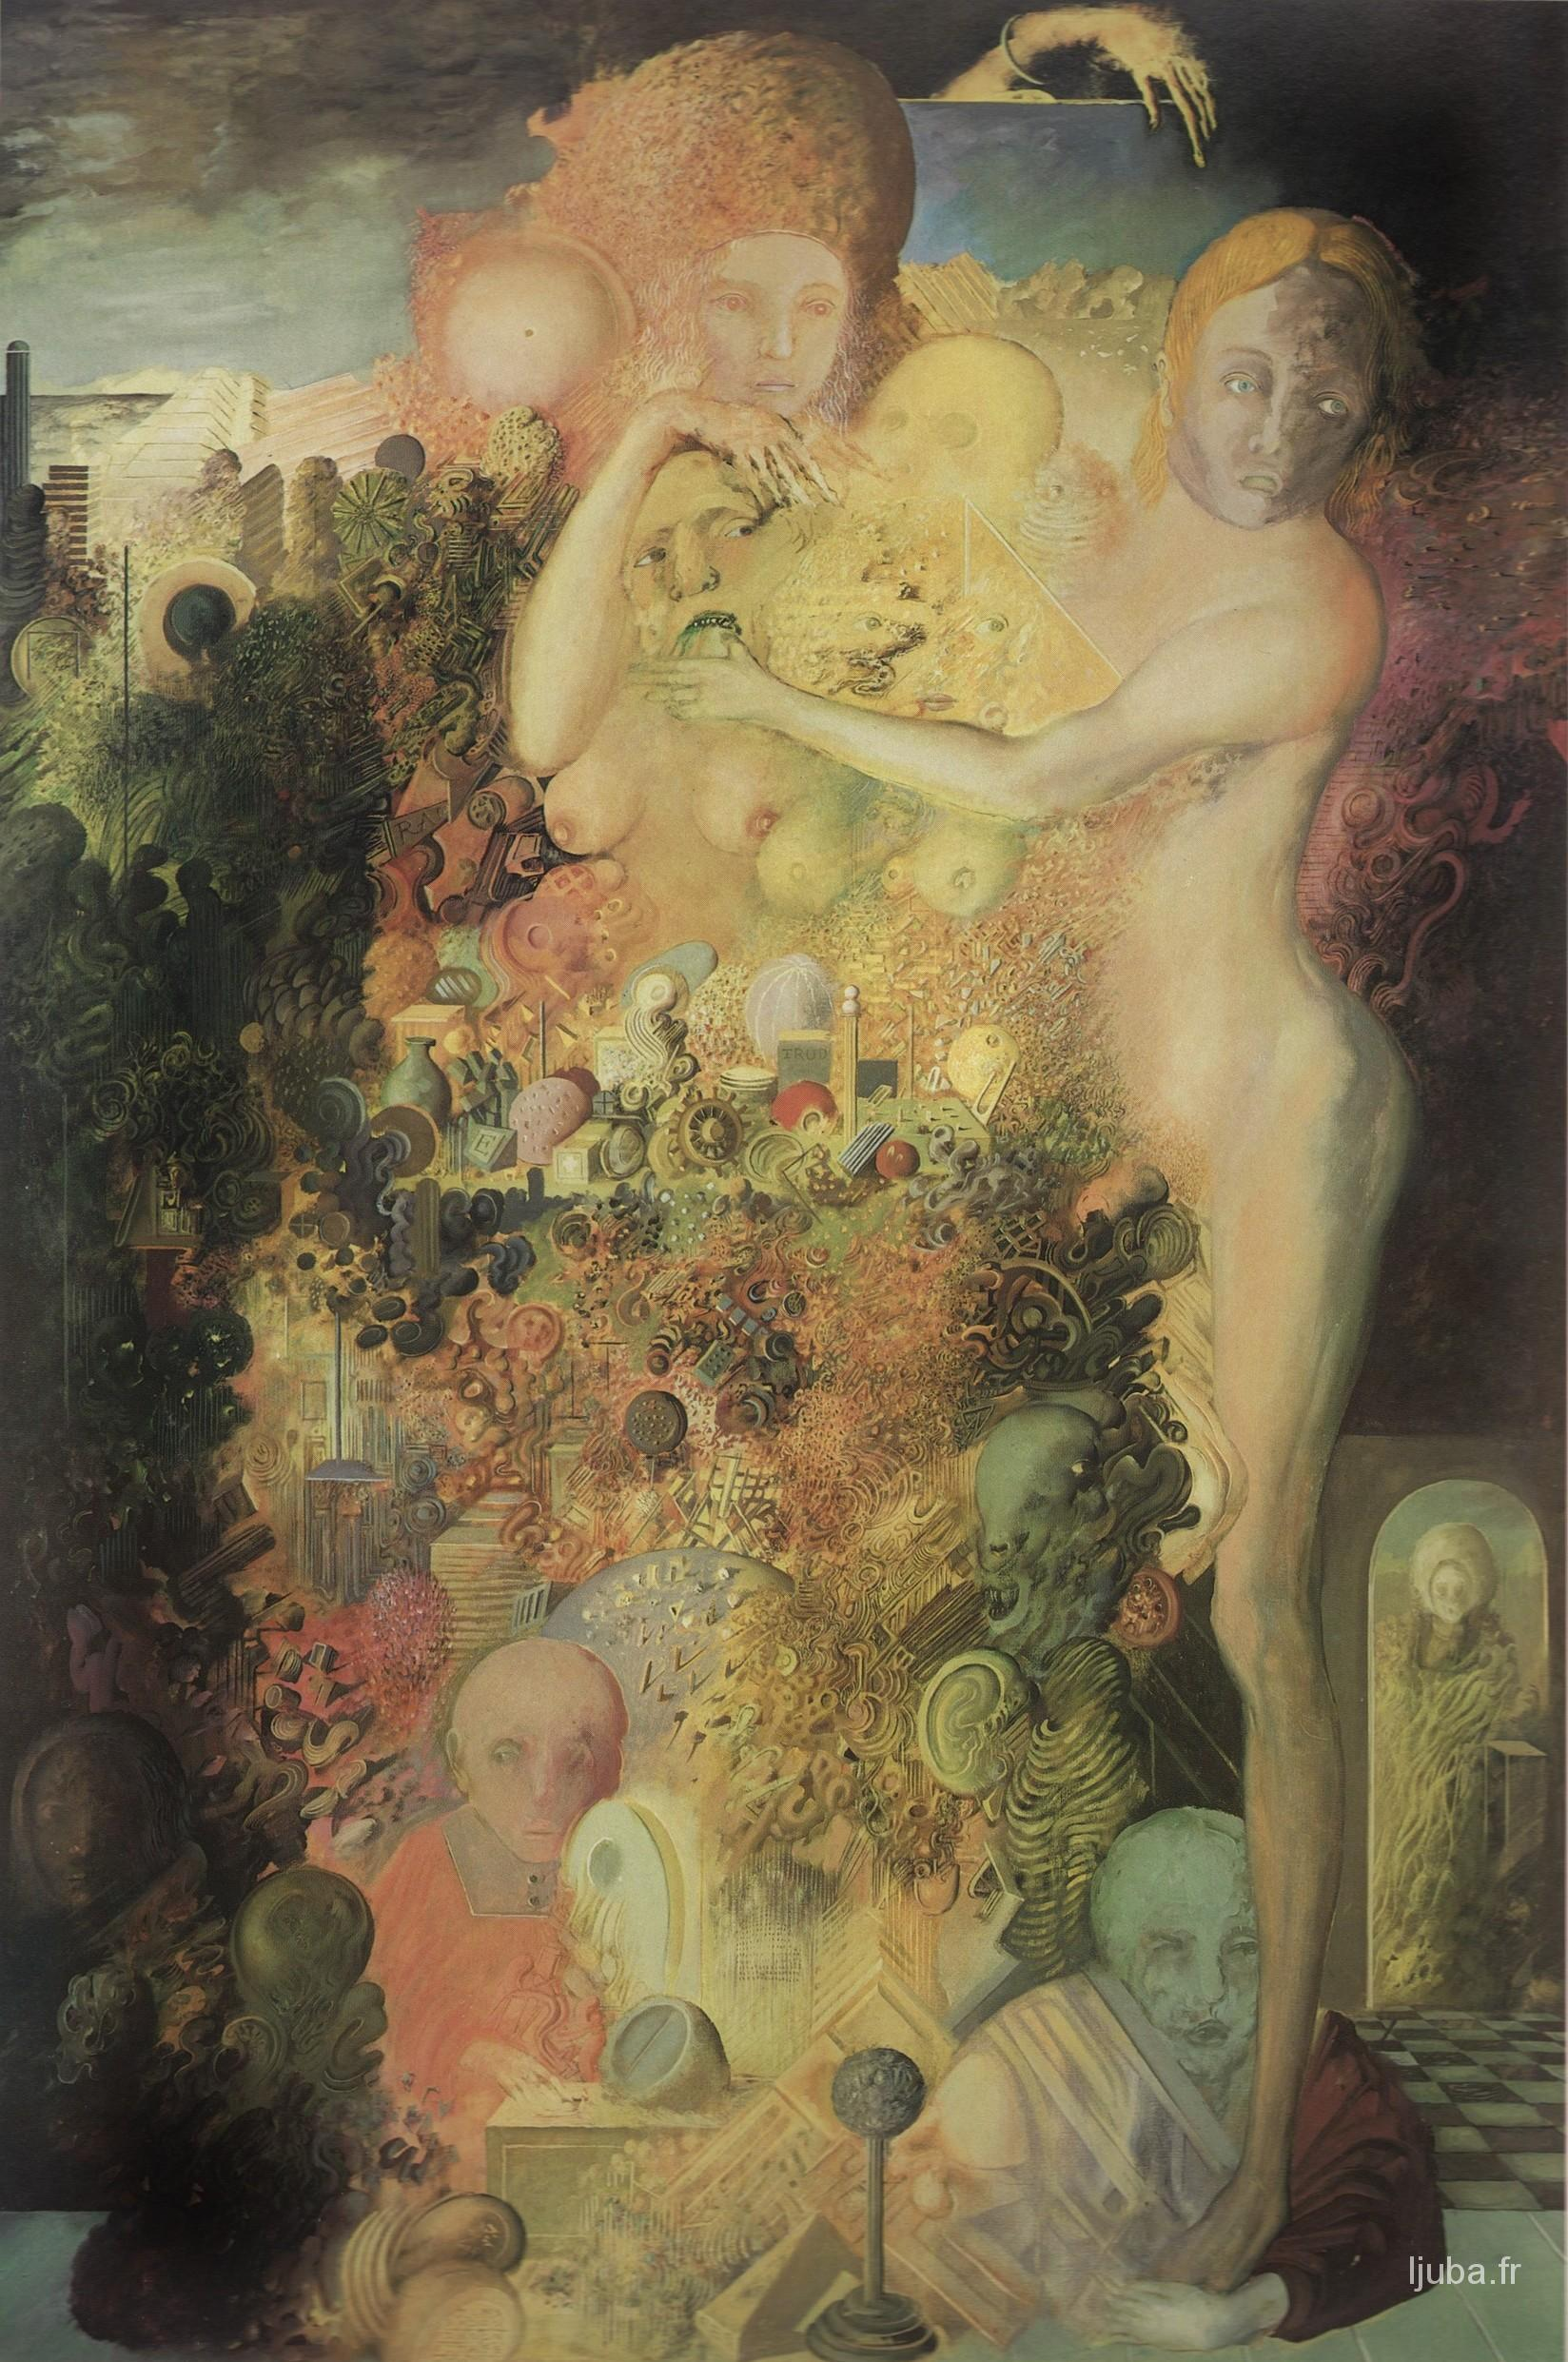 Ljuba Popovic - Le musée de chuchotement, 1975